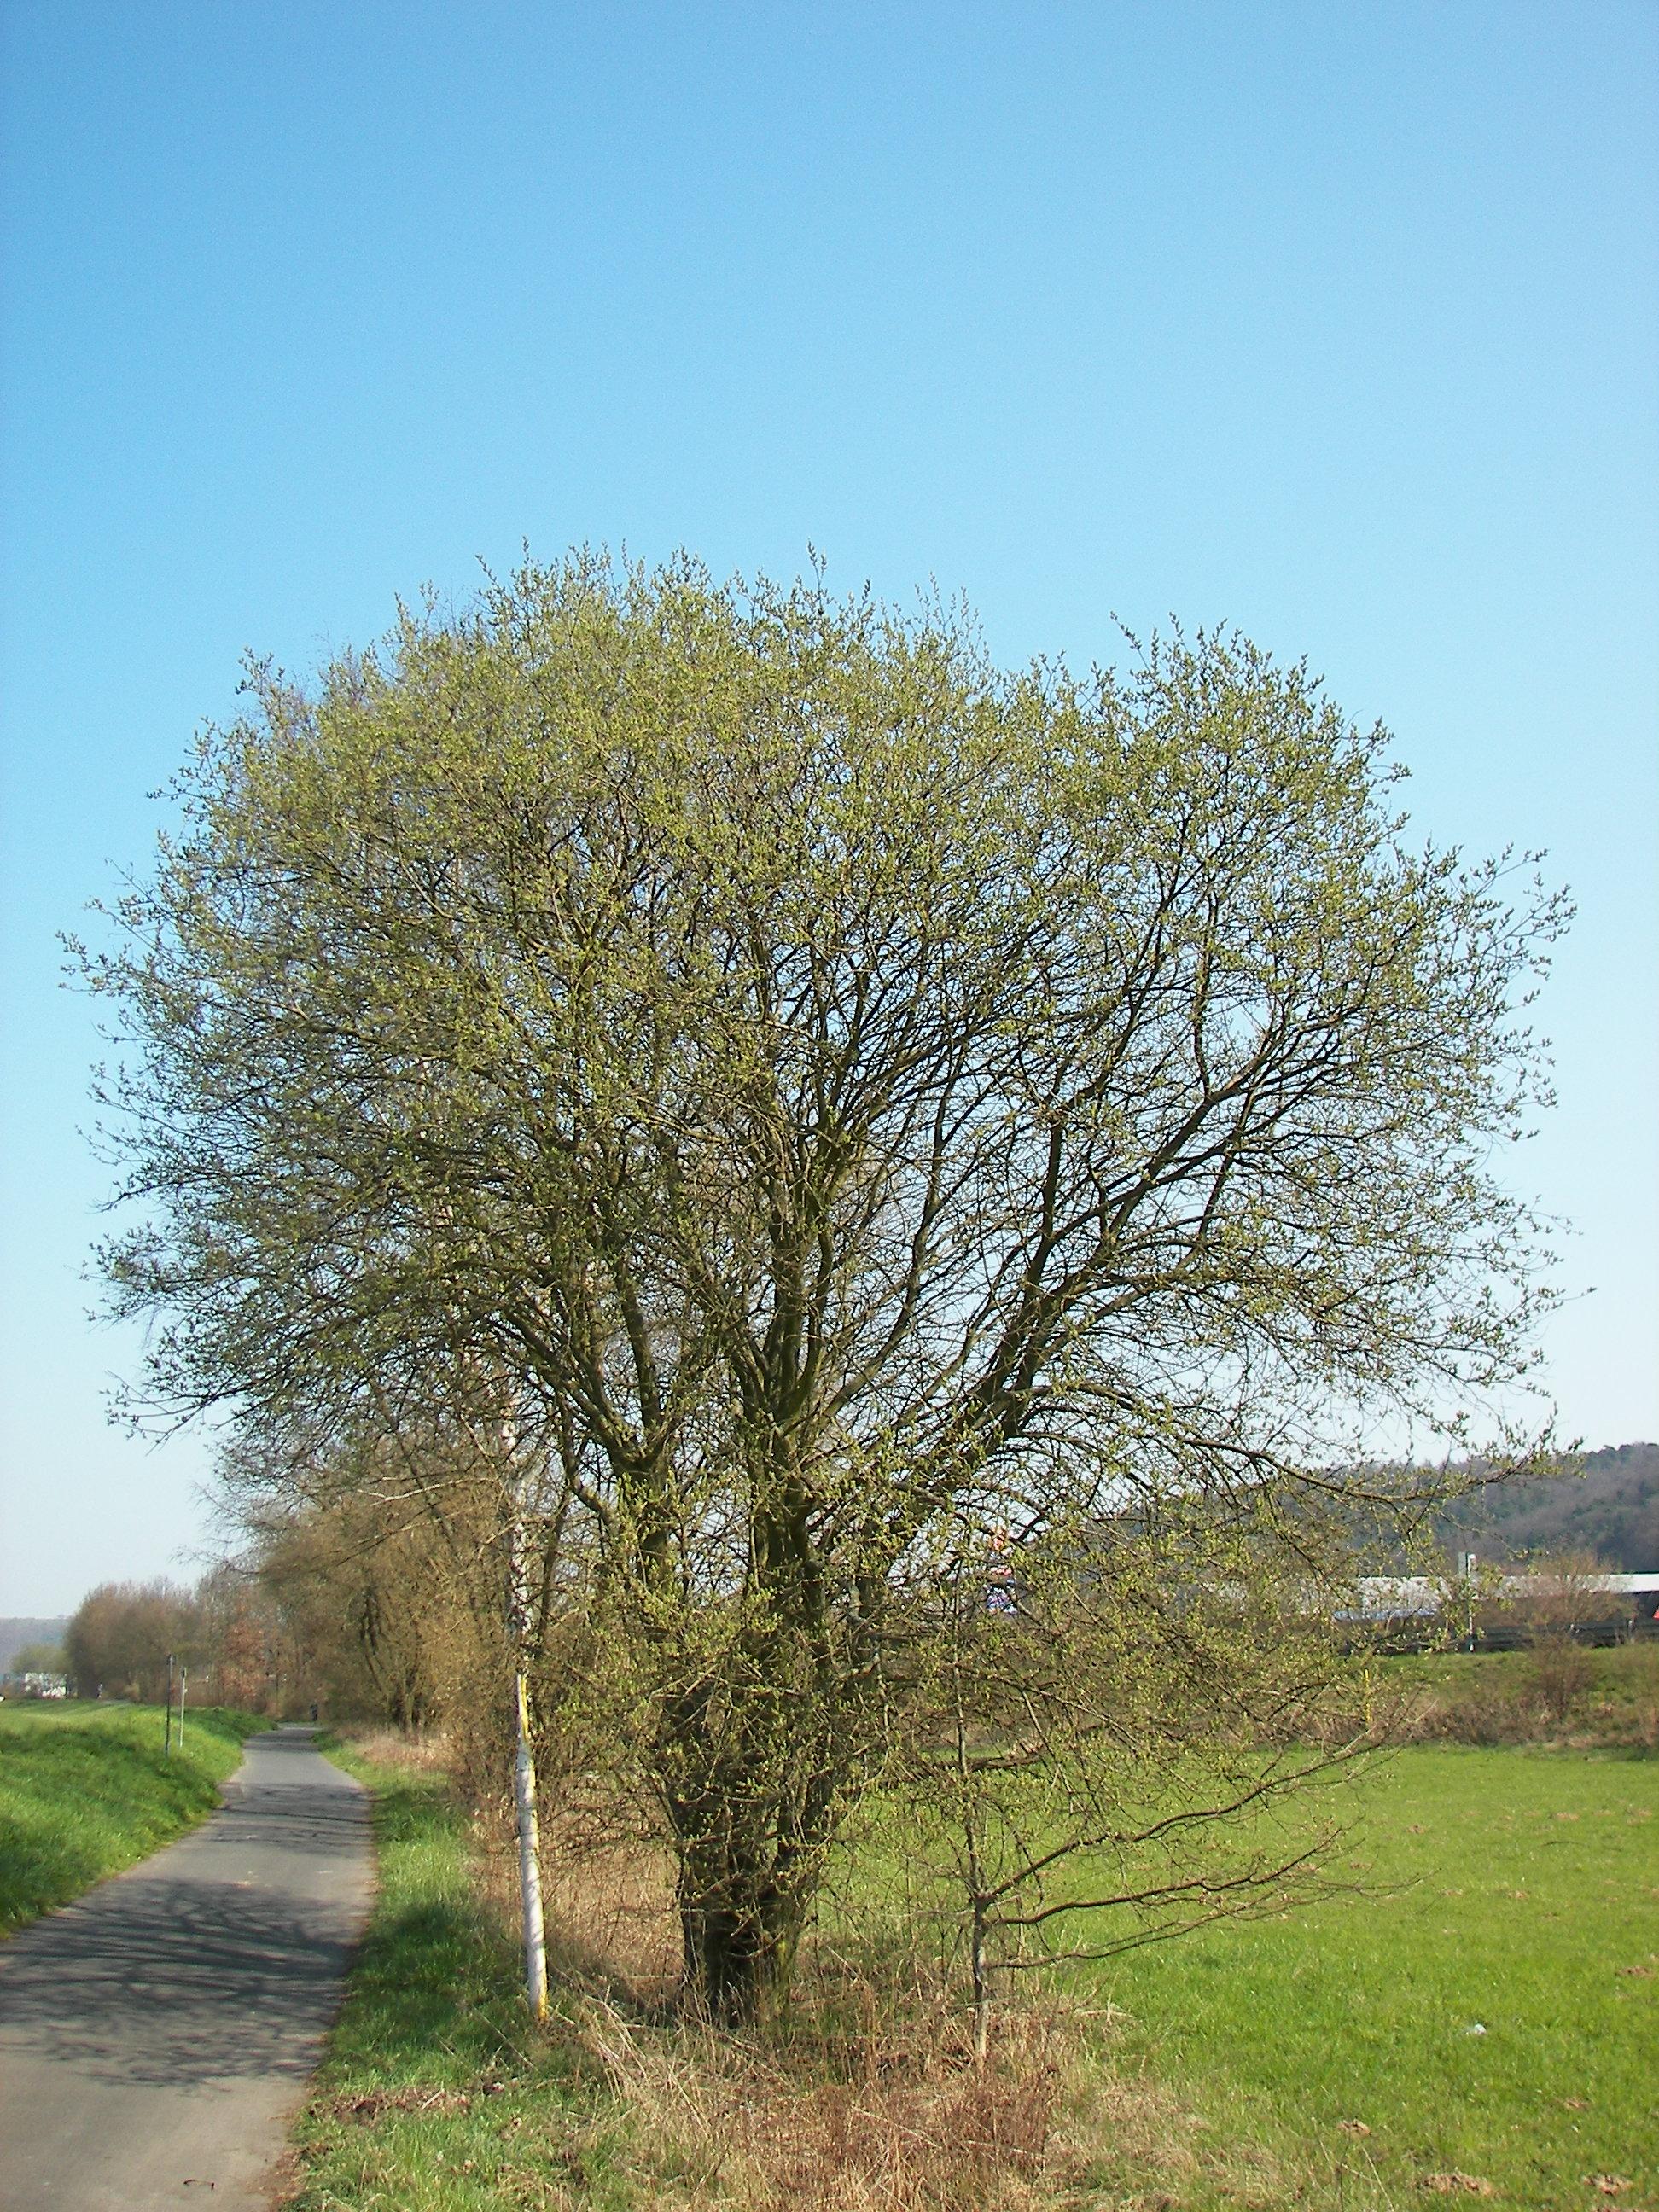 File:Salix caprea 007.jpg - Wikimedia Commons